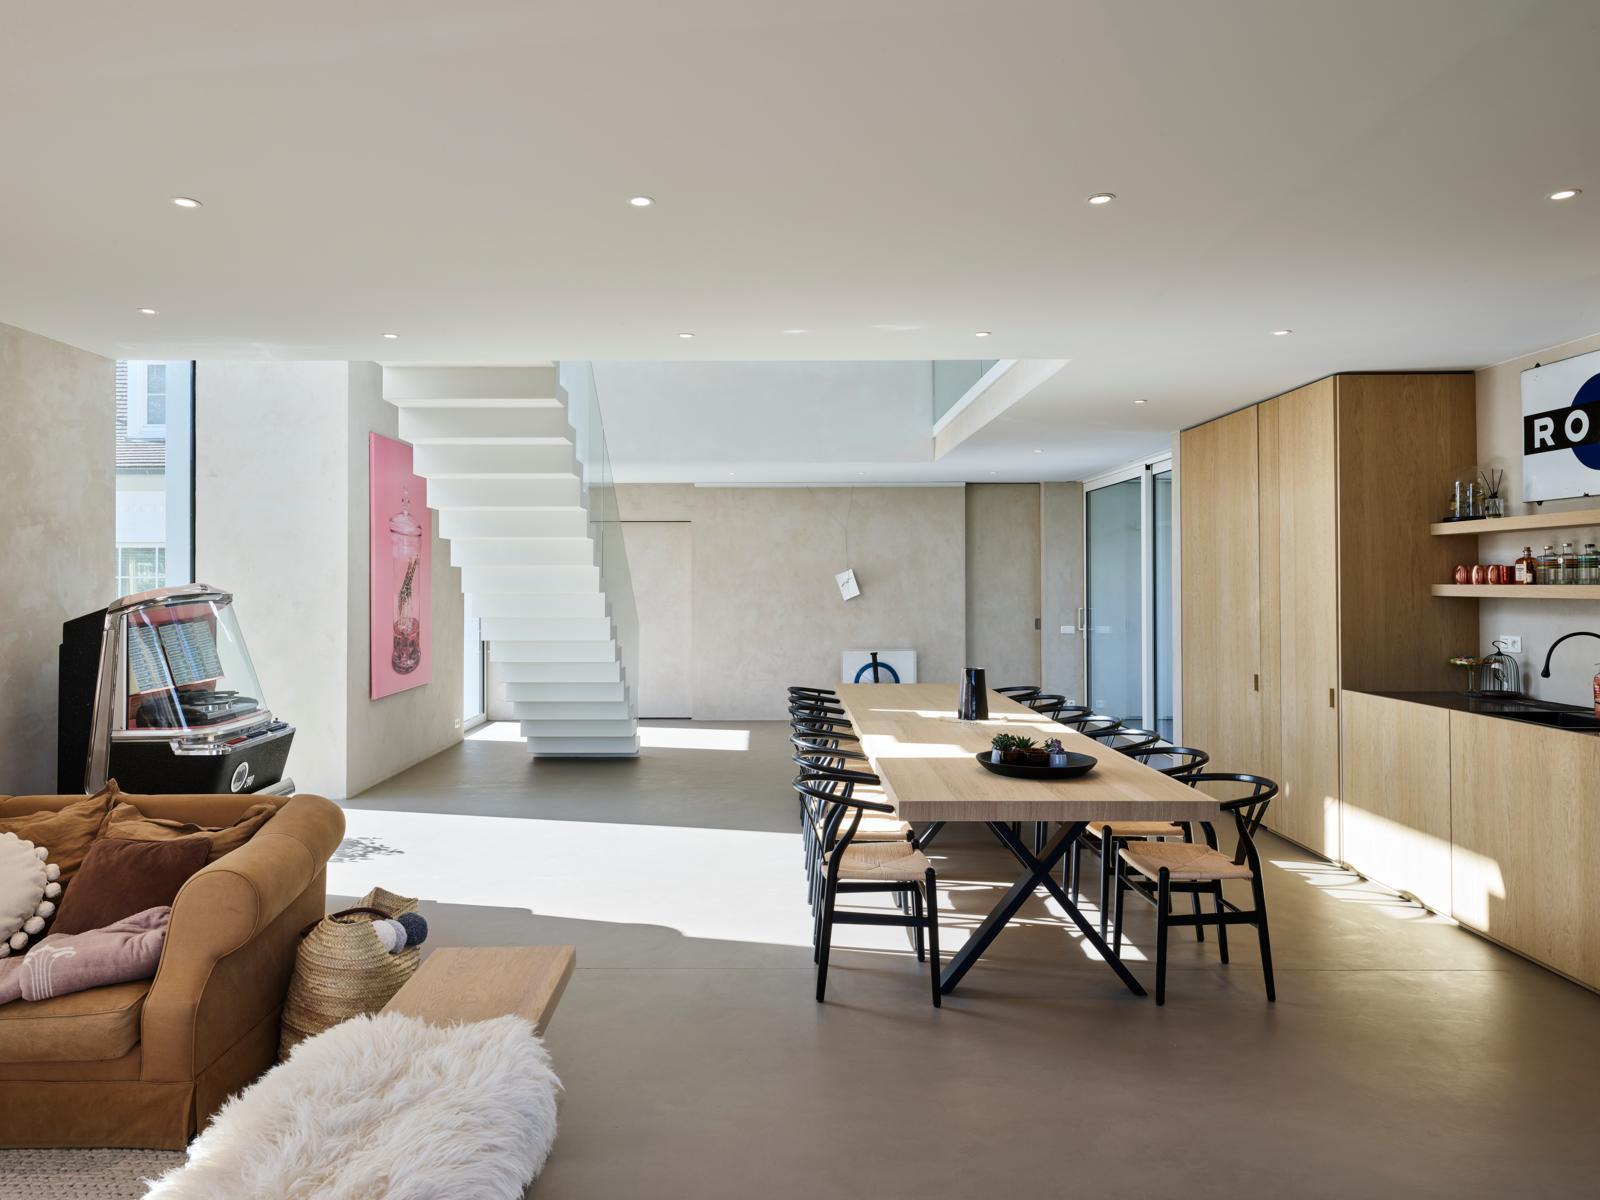 Residential mansion